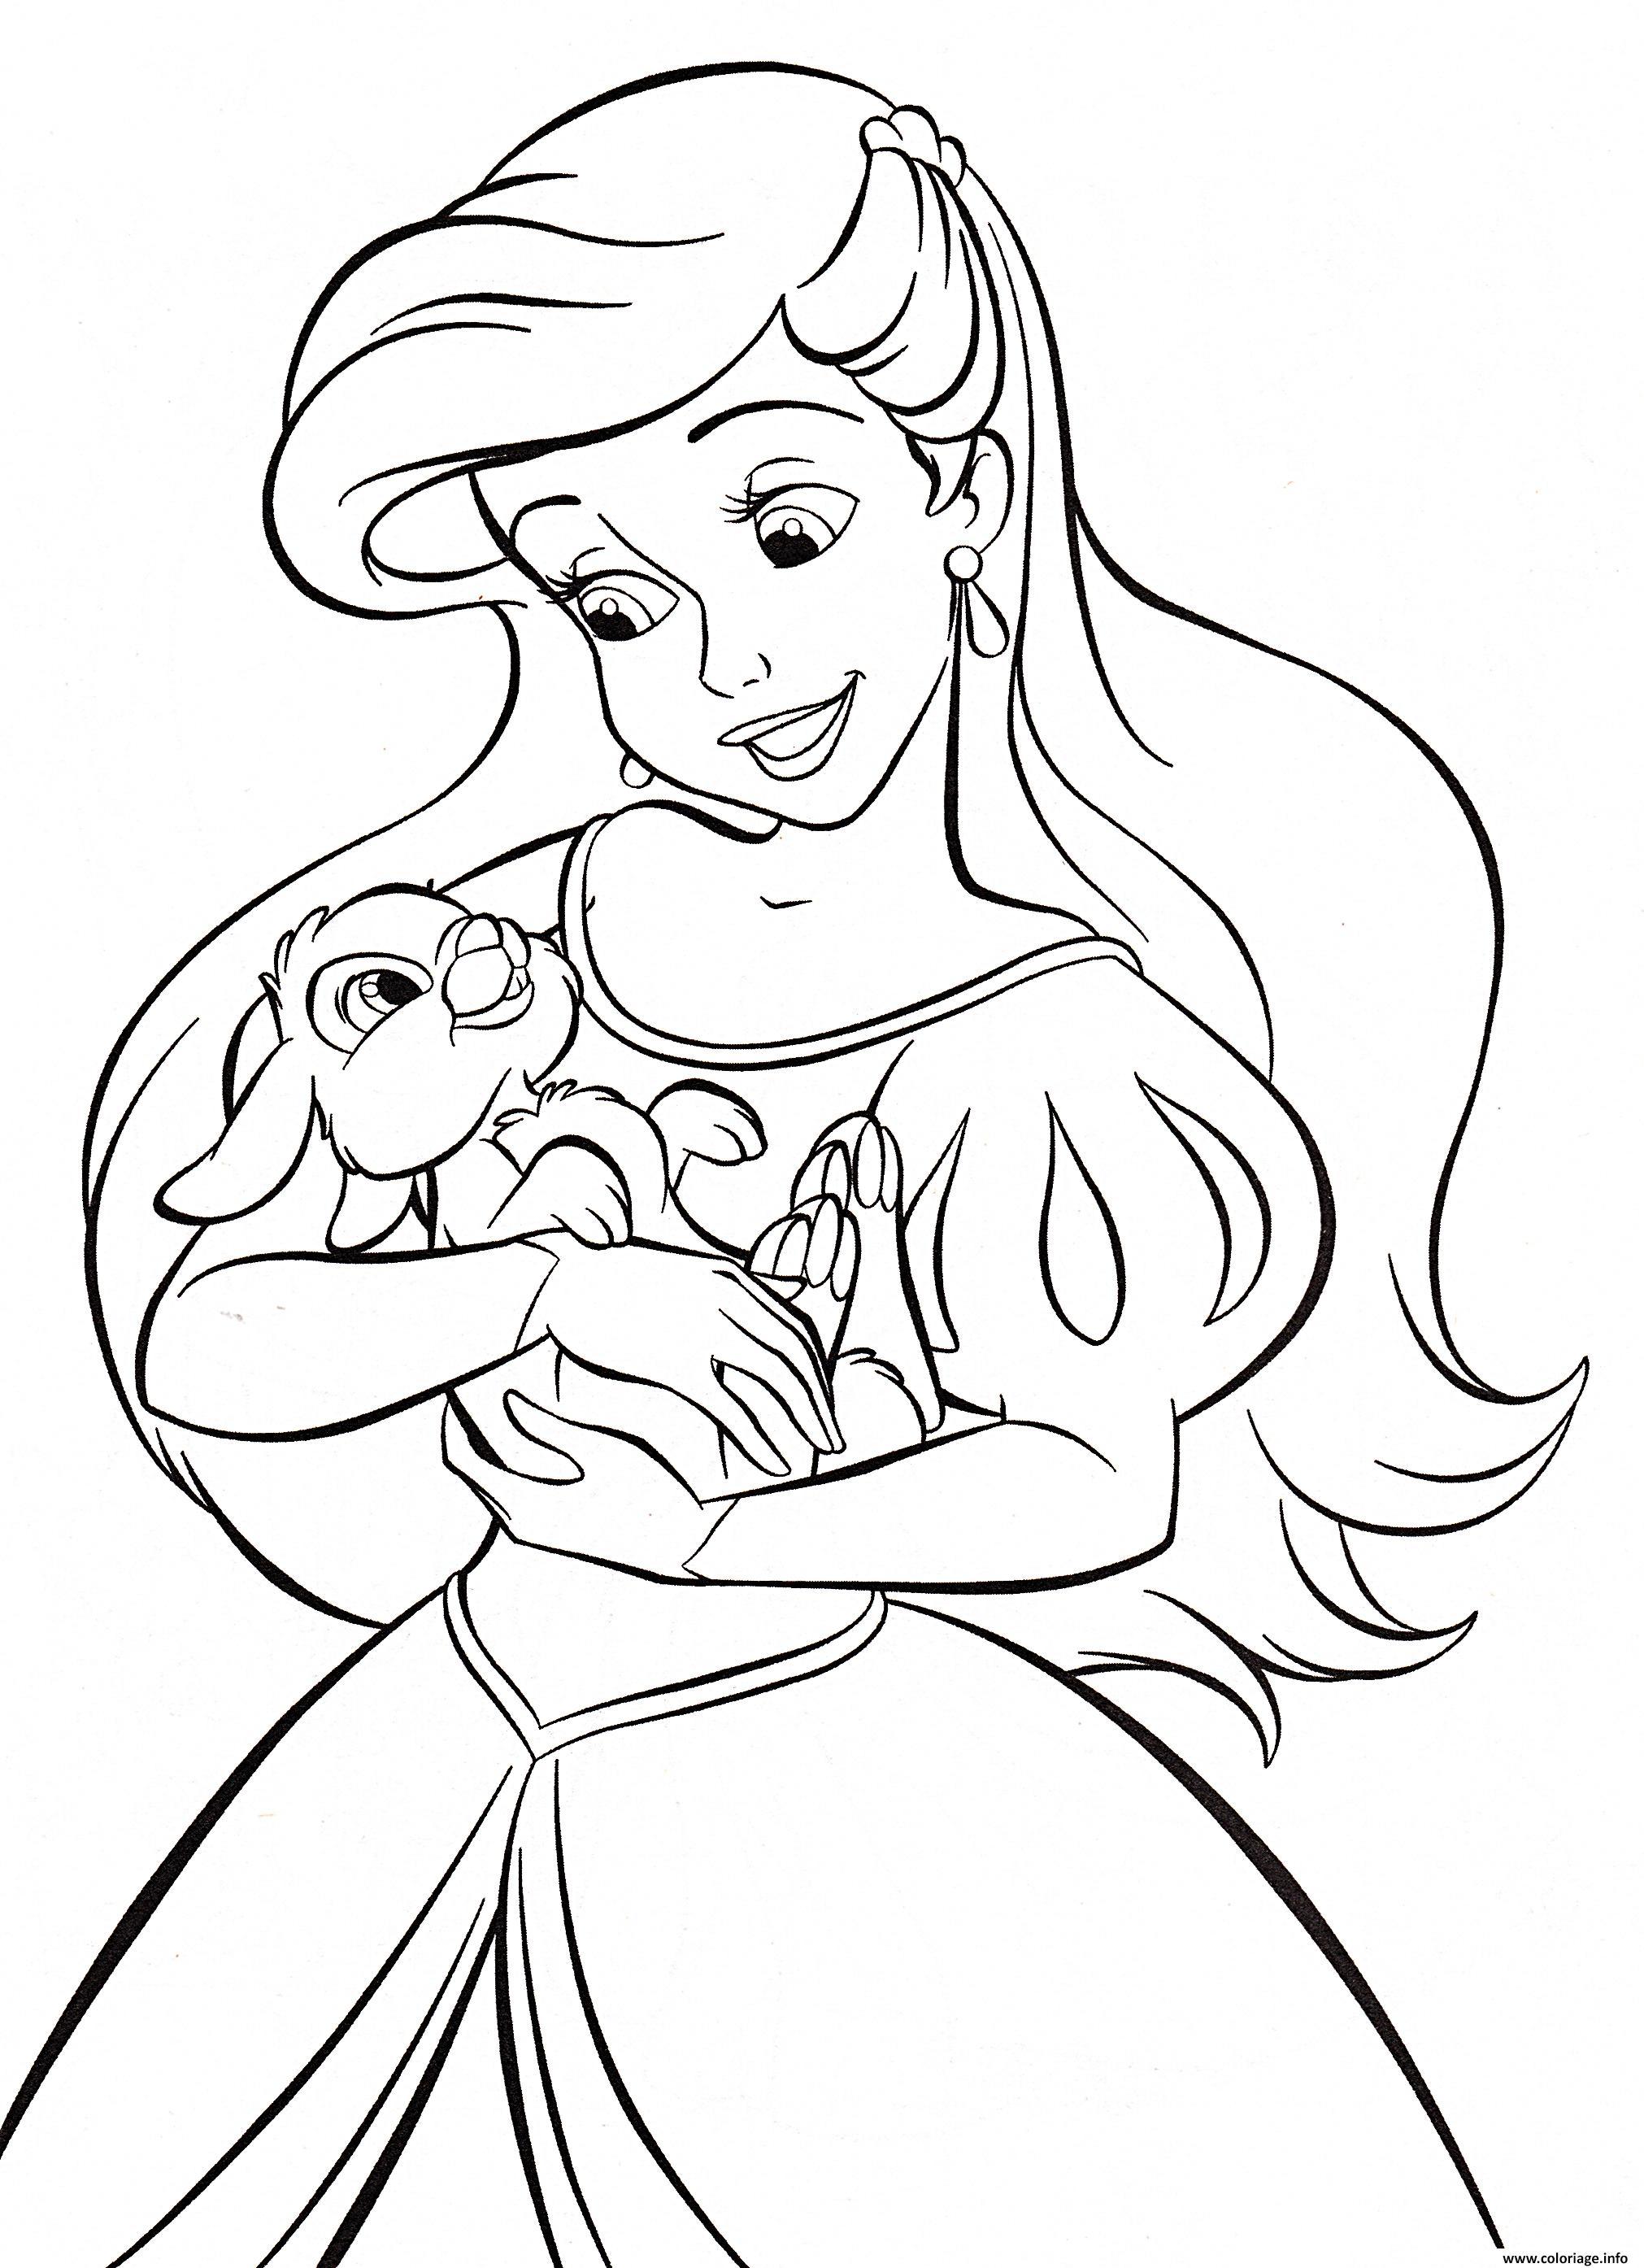 Coloriage petite sirene tient un lapin dessin - Sirene a colorier et imprimer ...